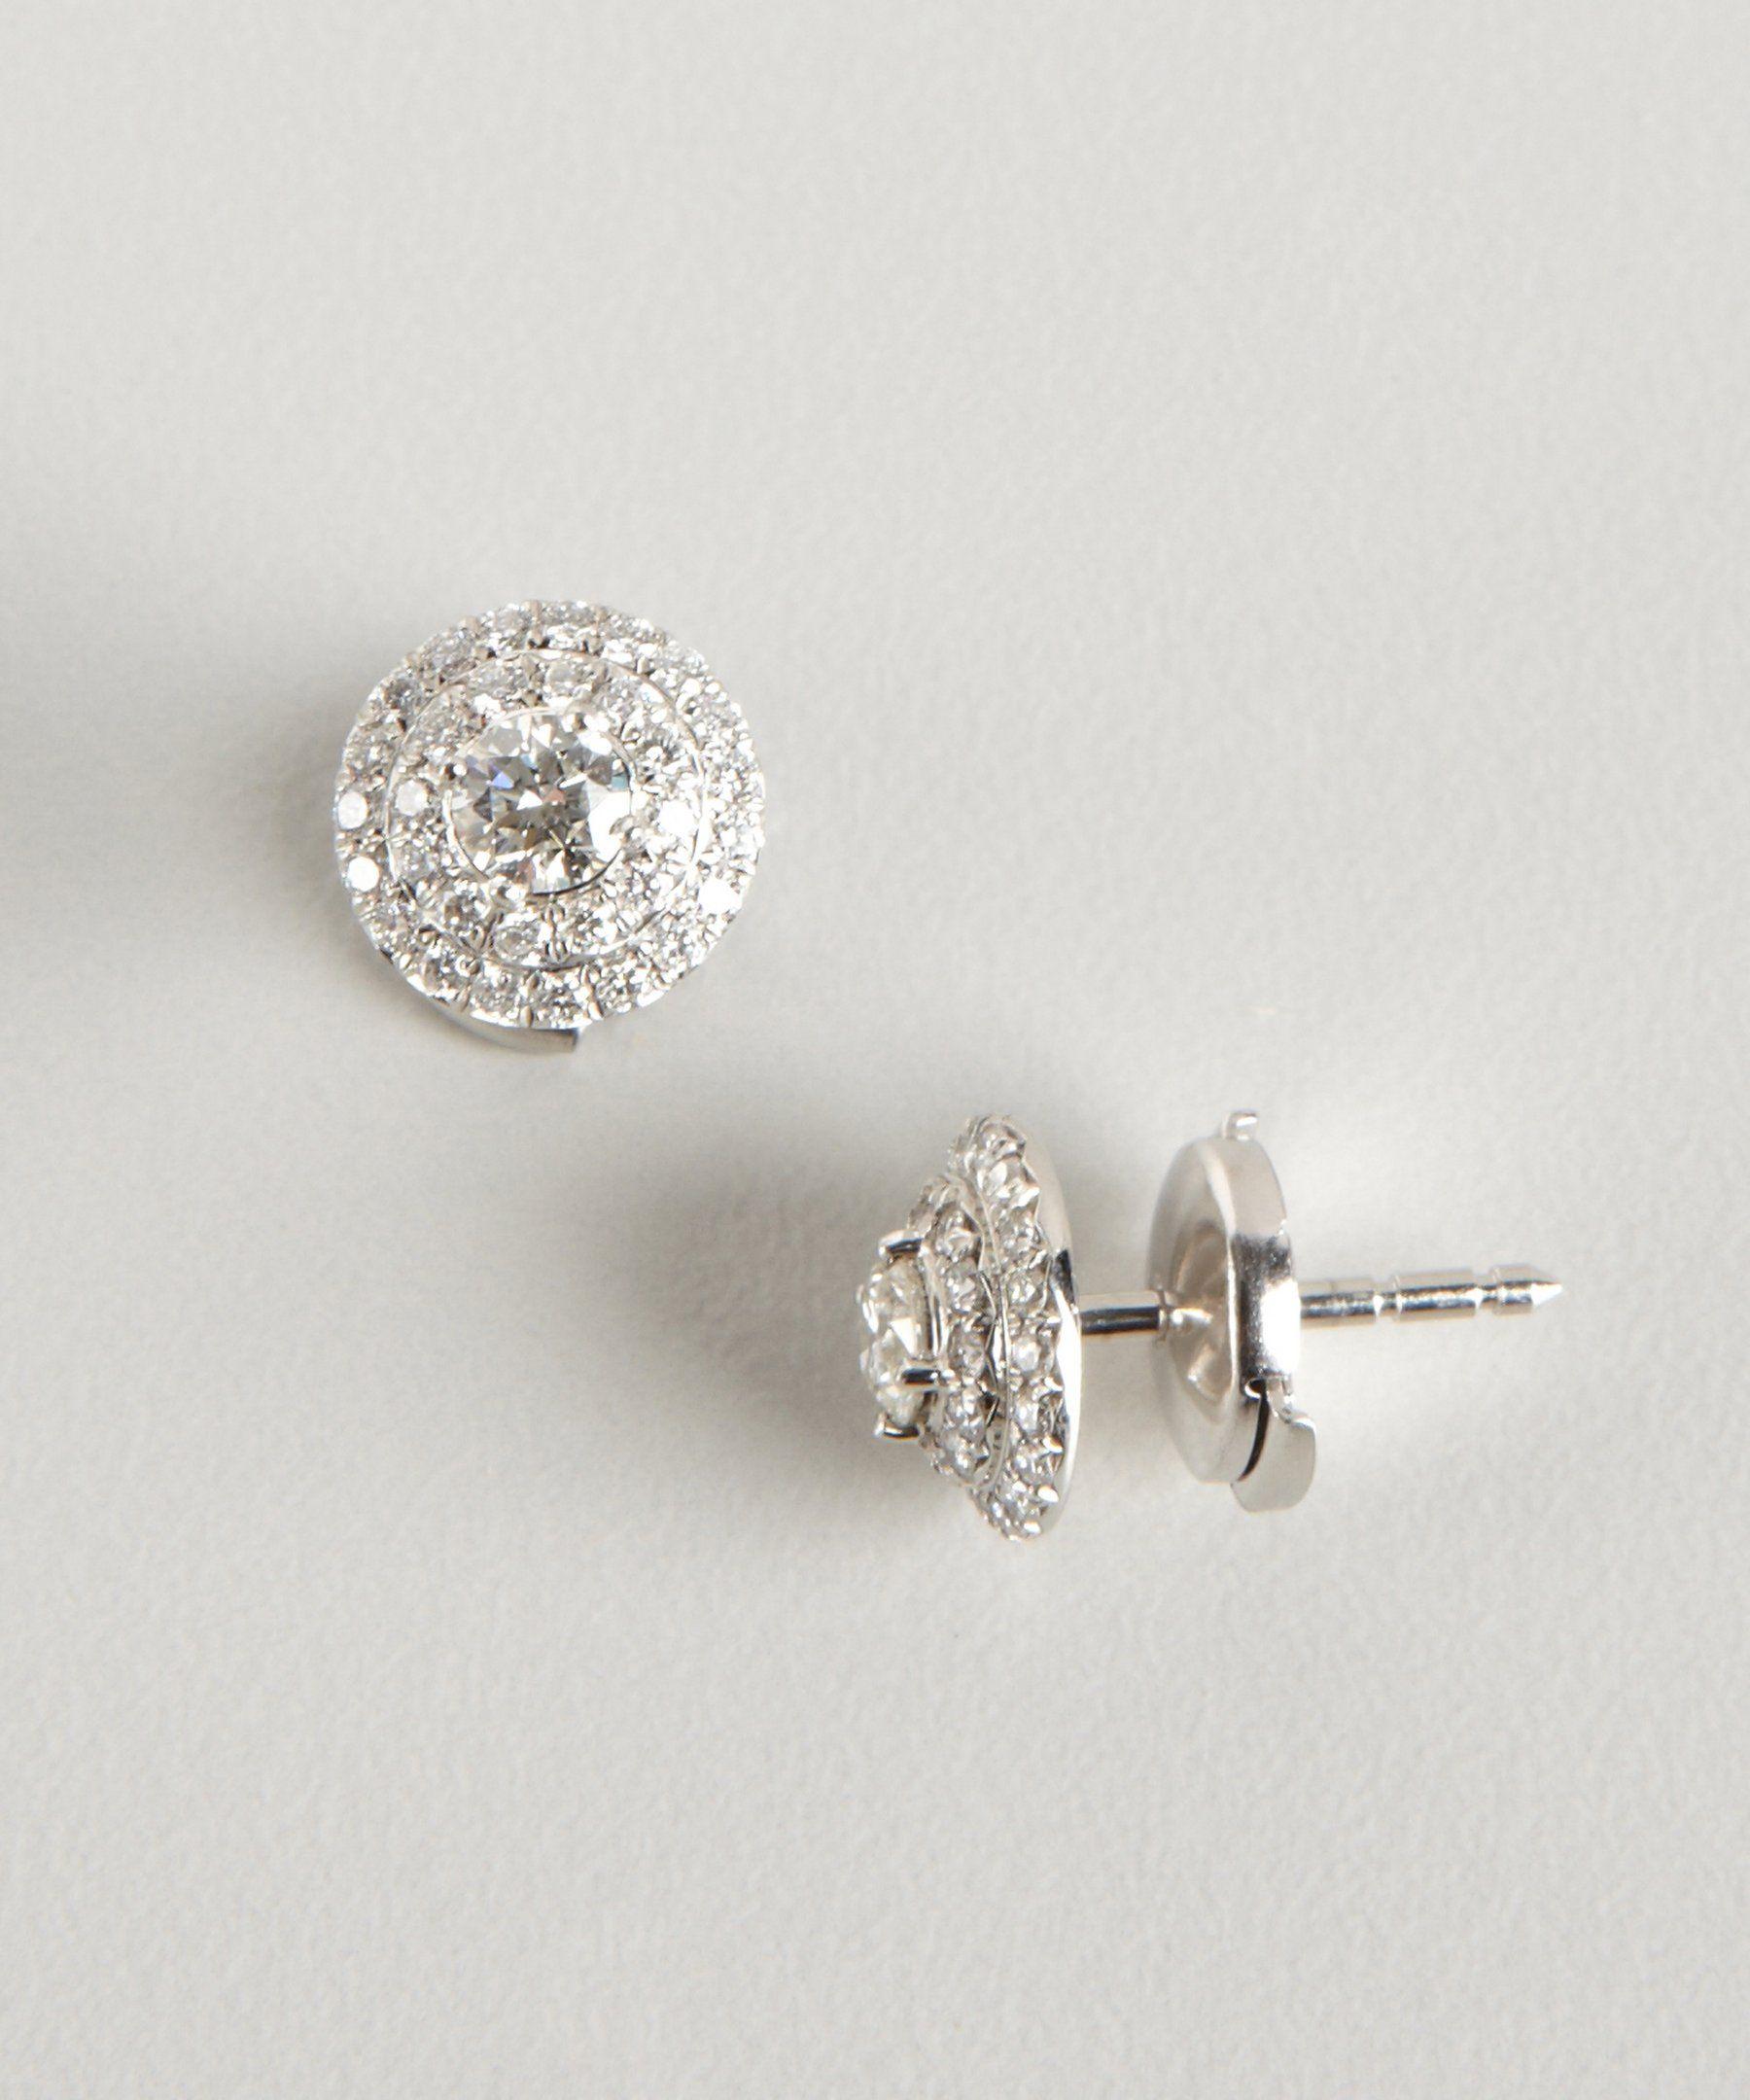 Tiffany Amp Co Tiffany Amp Co Diamond And Platinum Soleste